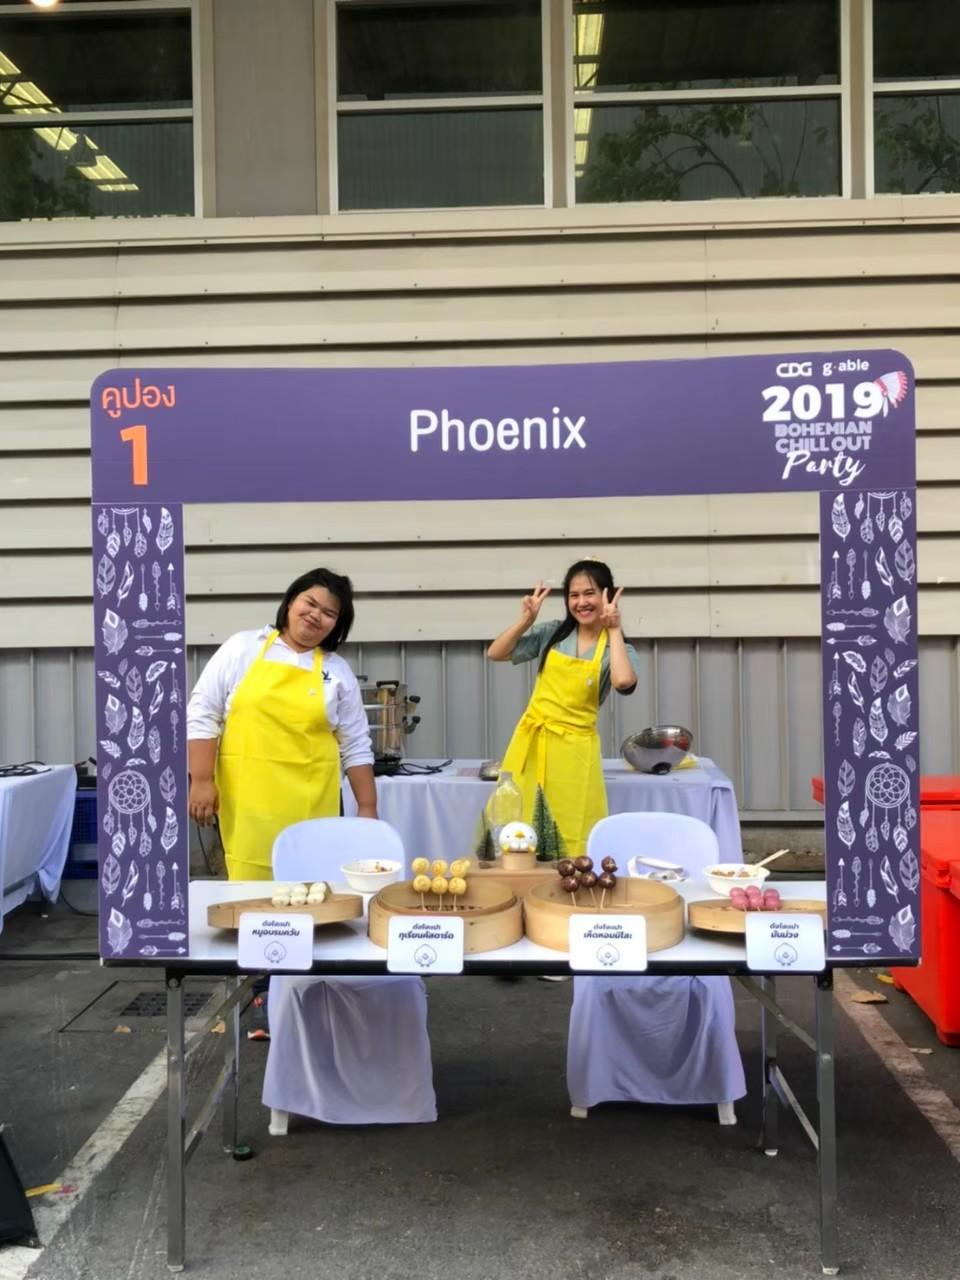 Snack Box  |   ขนมประชุม  อีเว้นท์   เขต วัฒนา สวนหลวง ห้วยขวาง  บางนา  |   ขนม Snack จาก Phoenix Lava